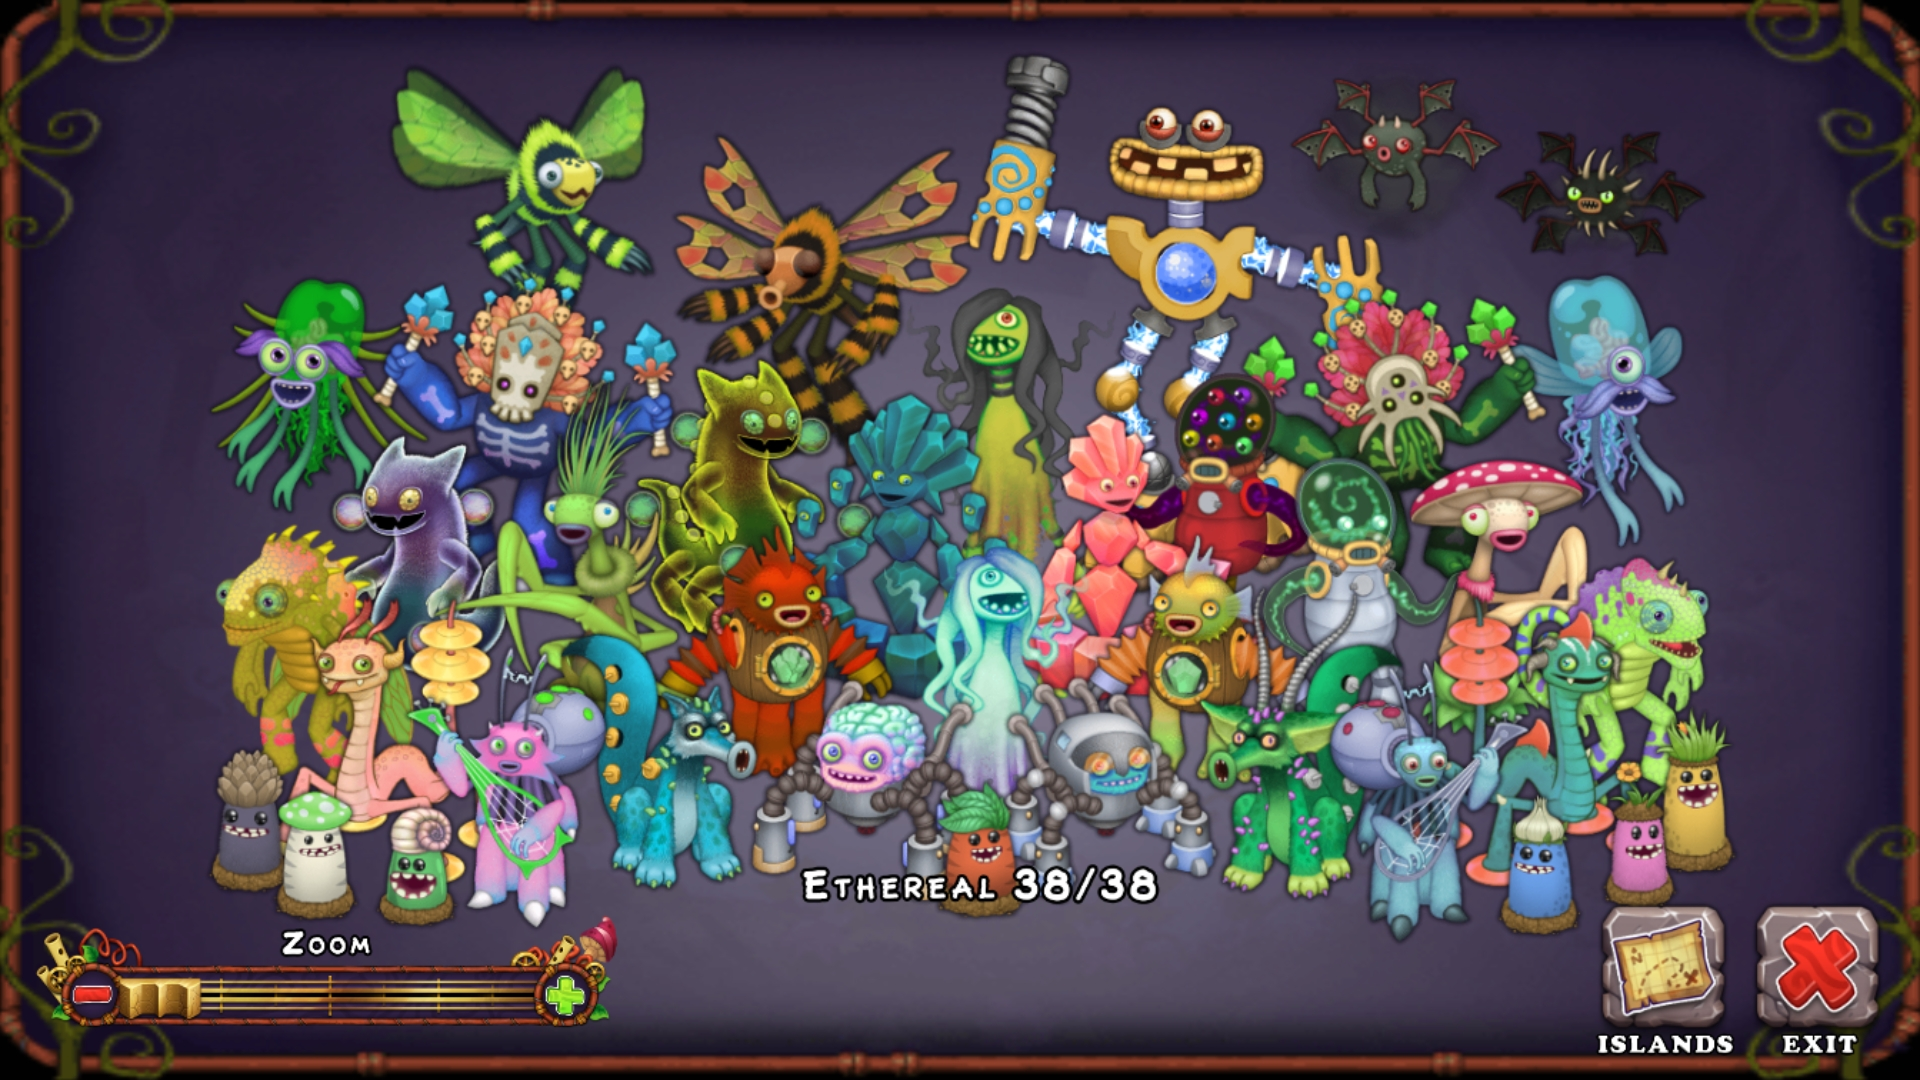 Complete Ethereal Island!